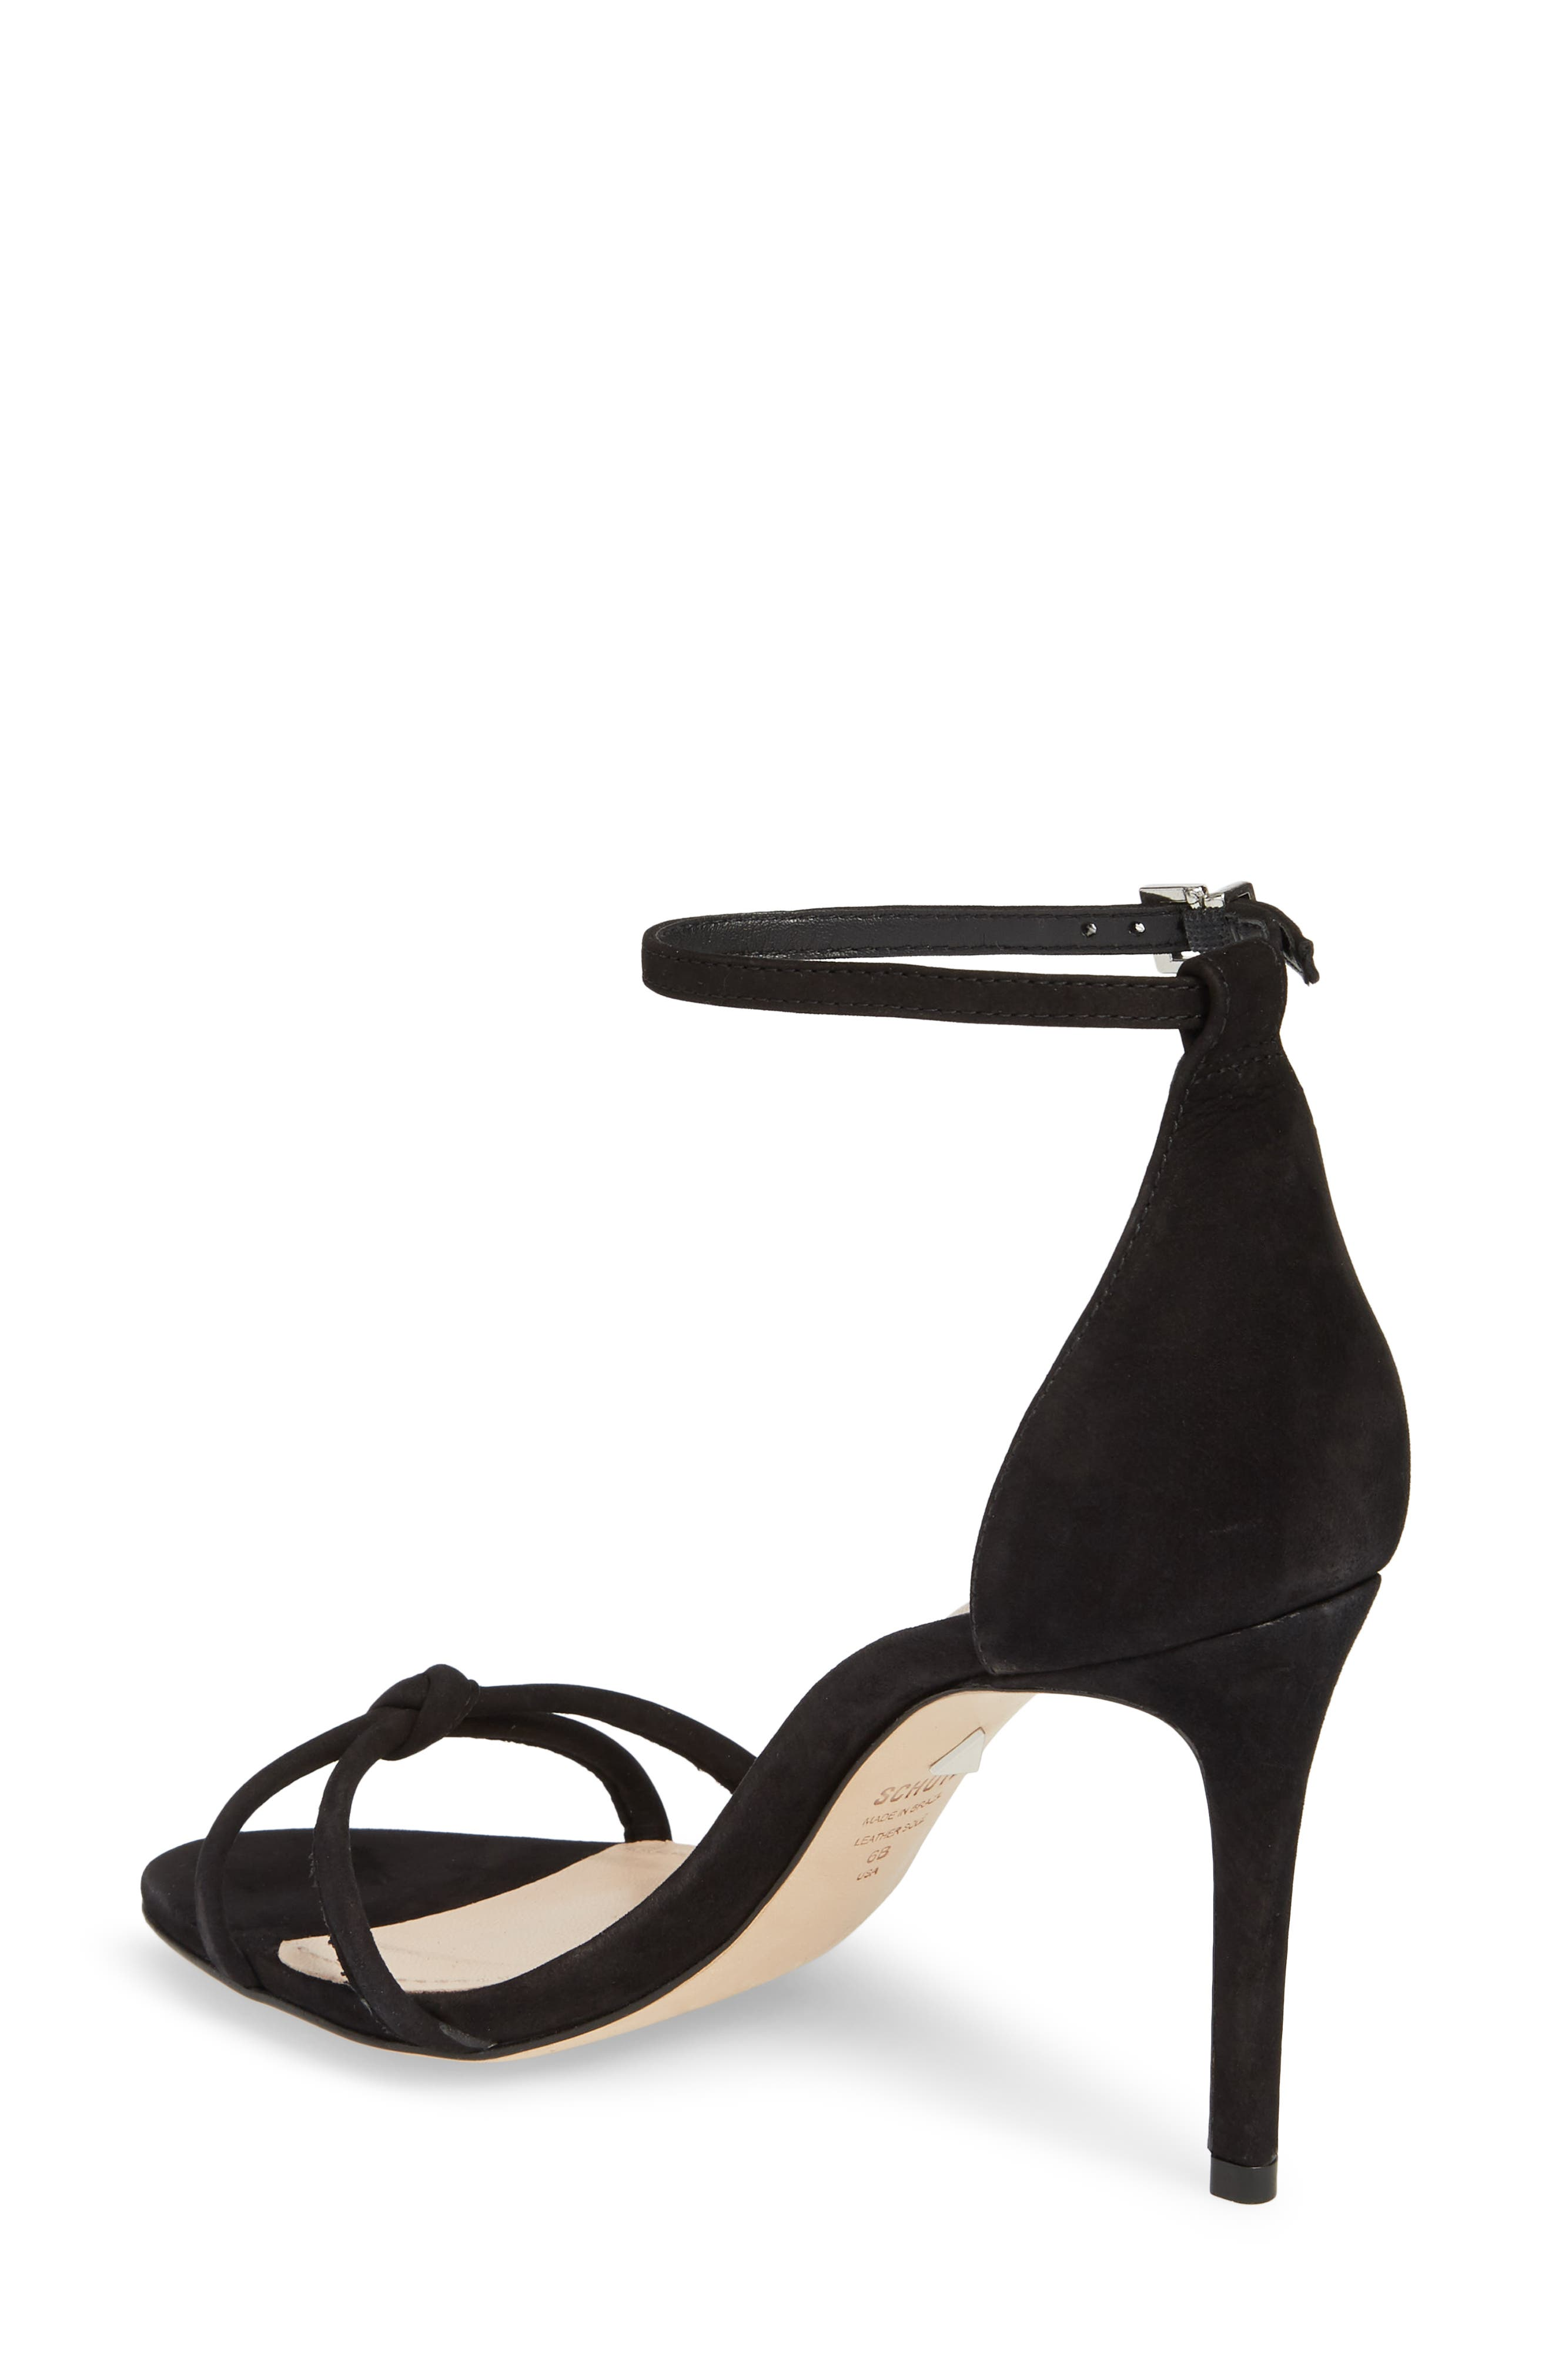 Rhana Ankle Strap Sandal,                             Alternate thumbnail 2, color,                             Black Leather